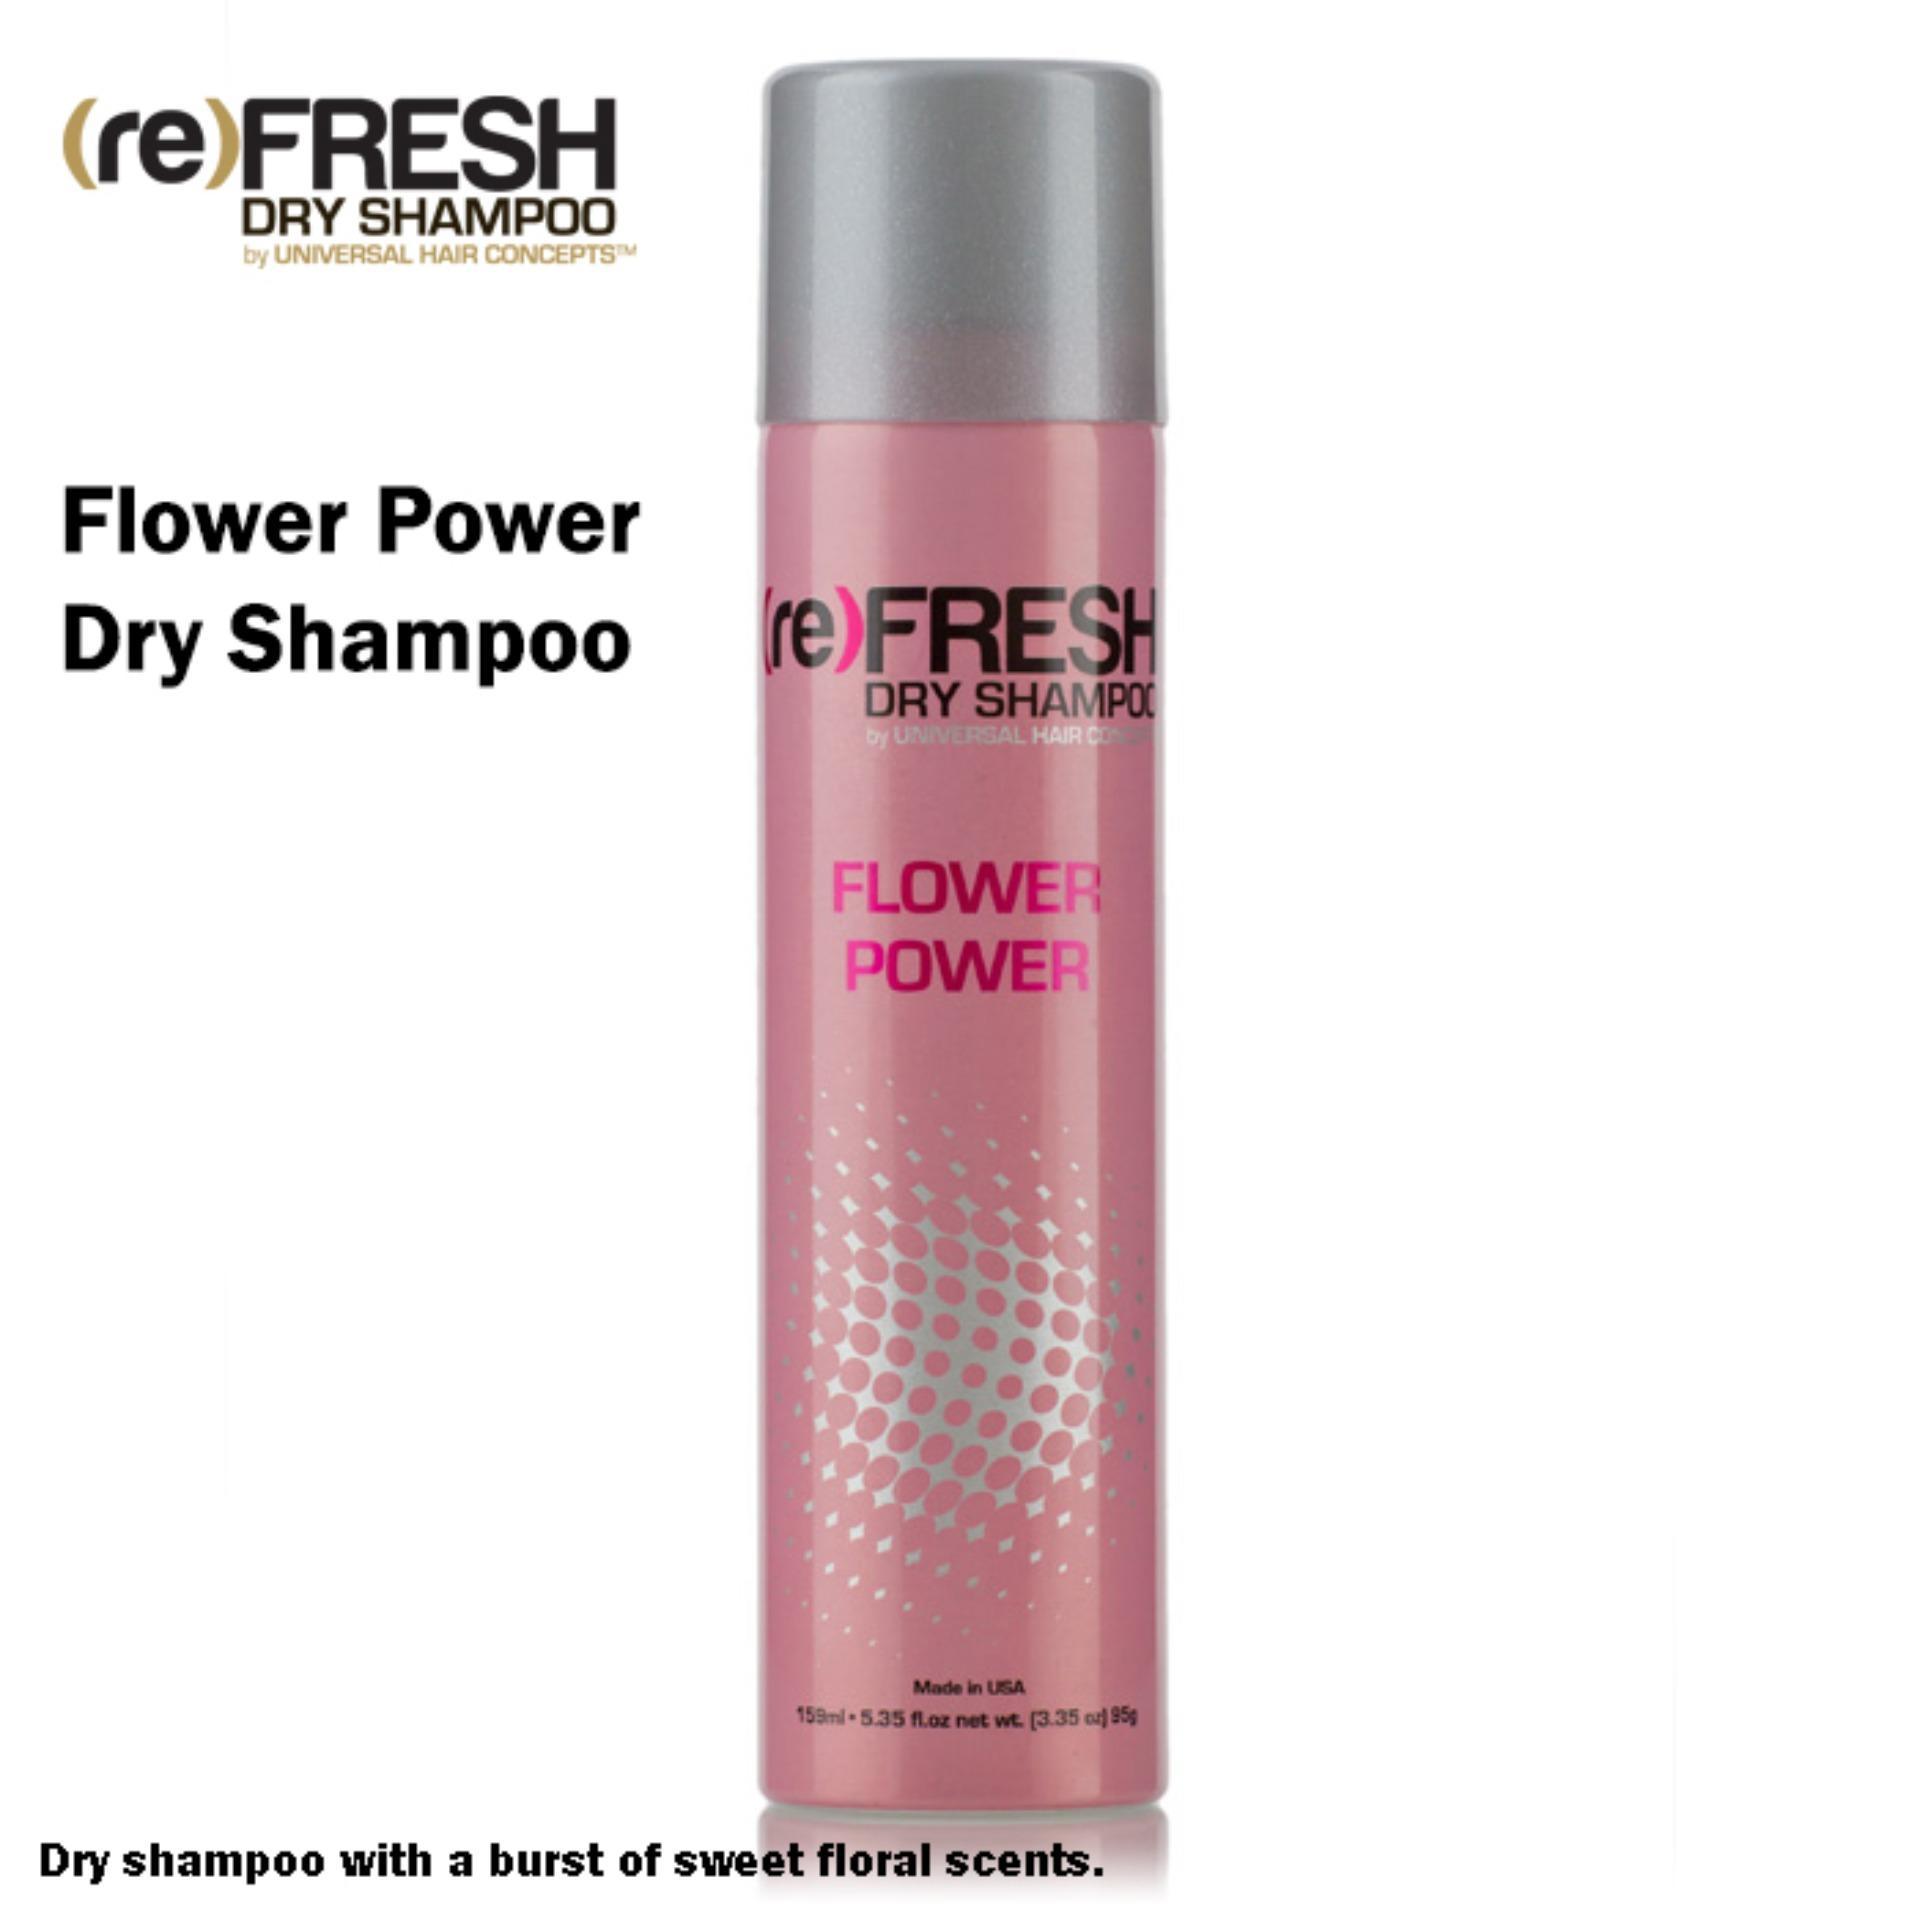 Black Magic Shampoo Bsy Noni Shampo Keramas Original Bpom Bandingkan Toko Flower Power Refresh 159 Ml Dry Kering 100